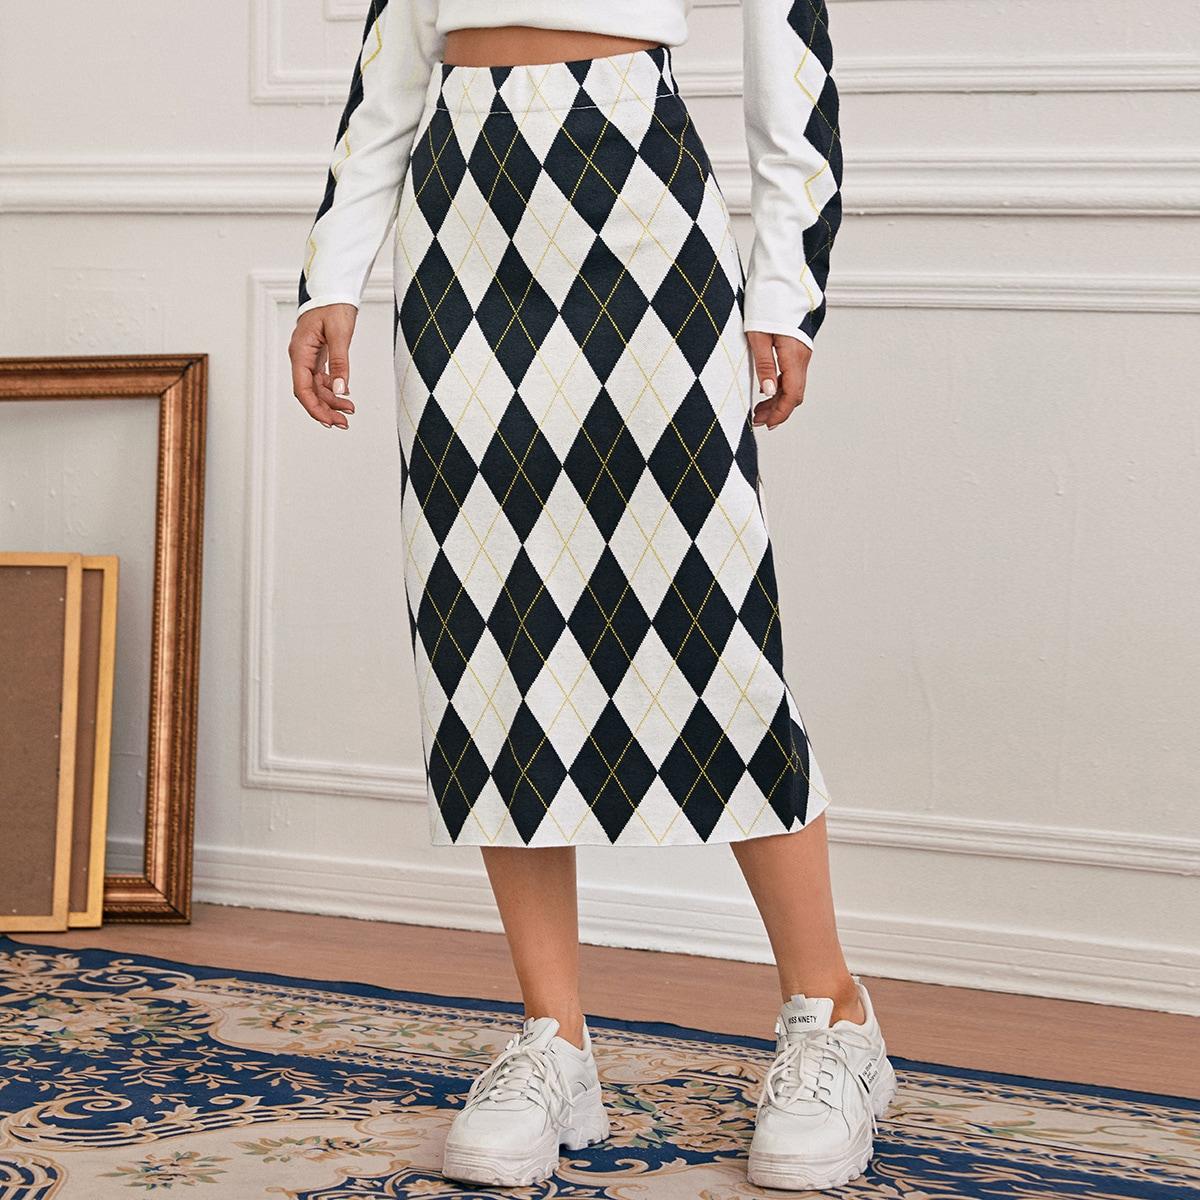 Трикотажная юбка с ромбическим рисунком